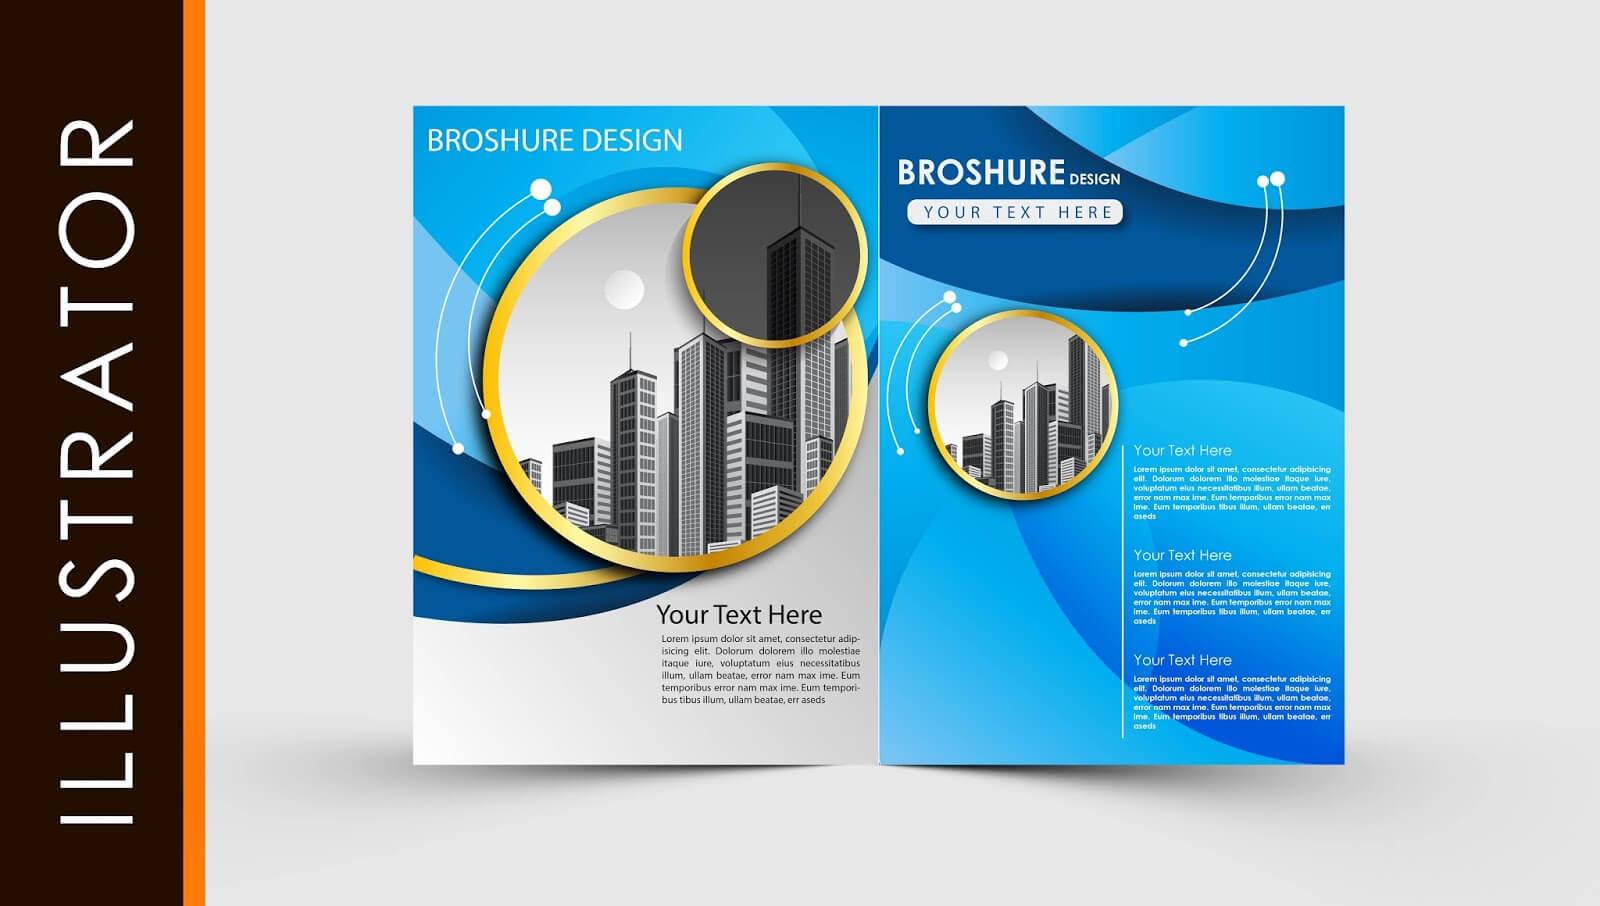 Free Download Adobe Illustrator Template Brochure Two Fold Throughout Brochure Template Illustrator Free Download